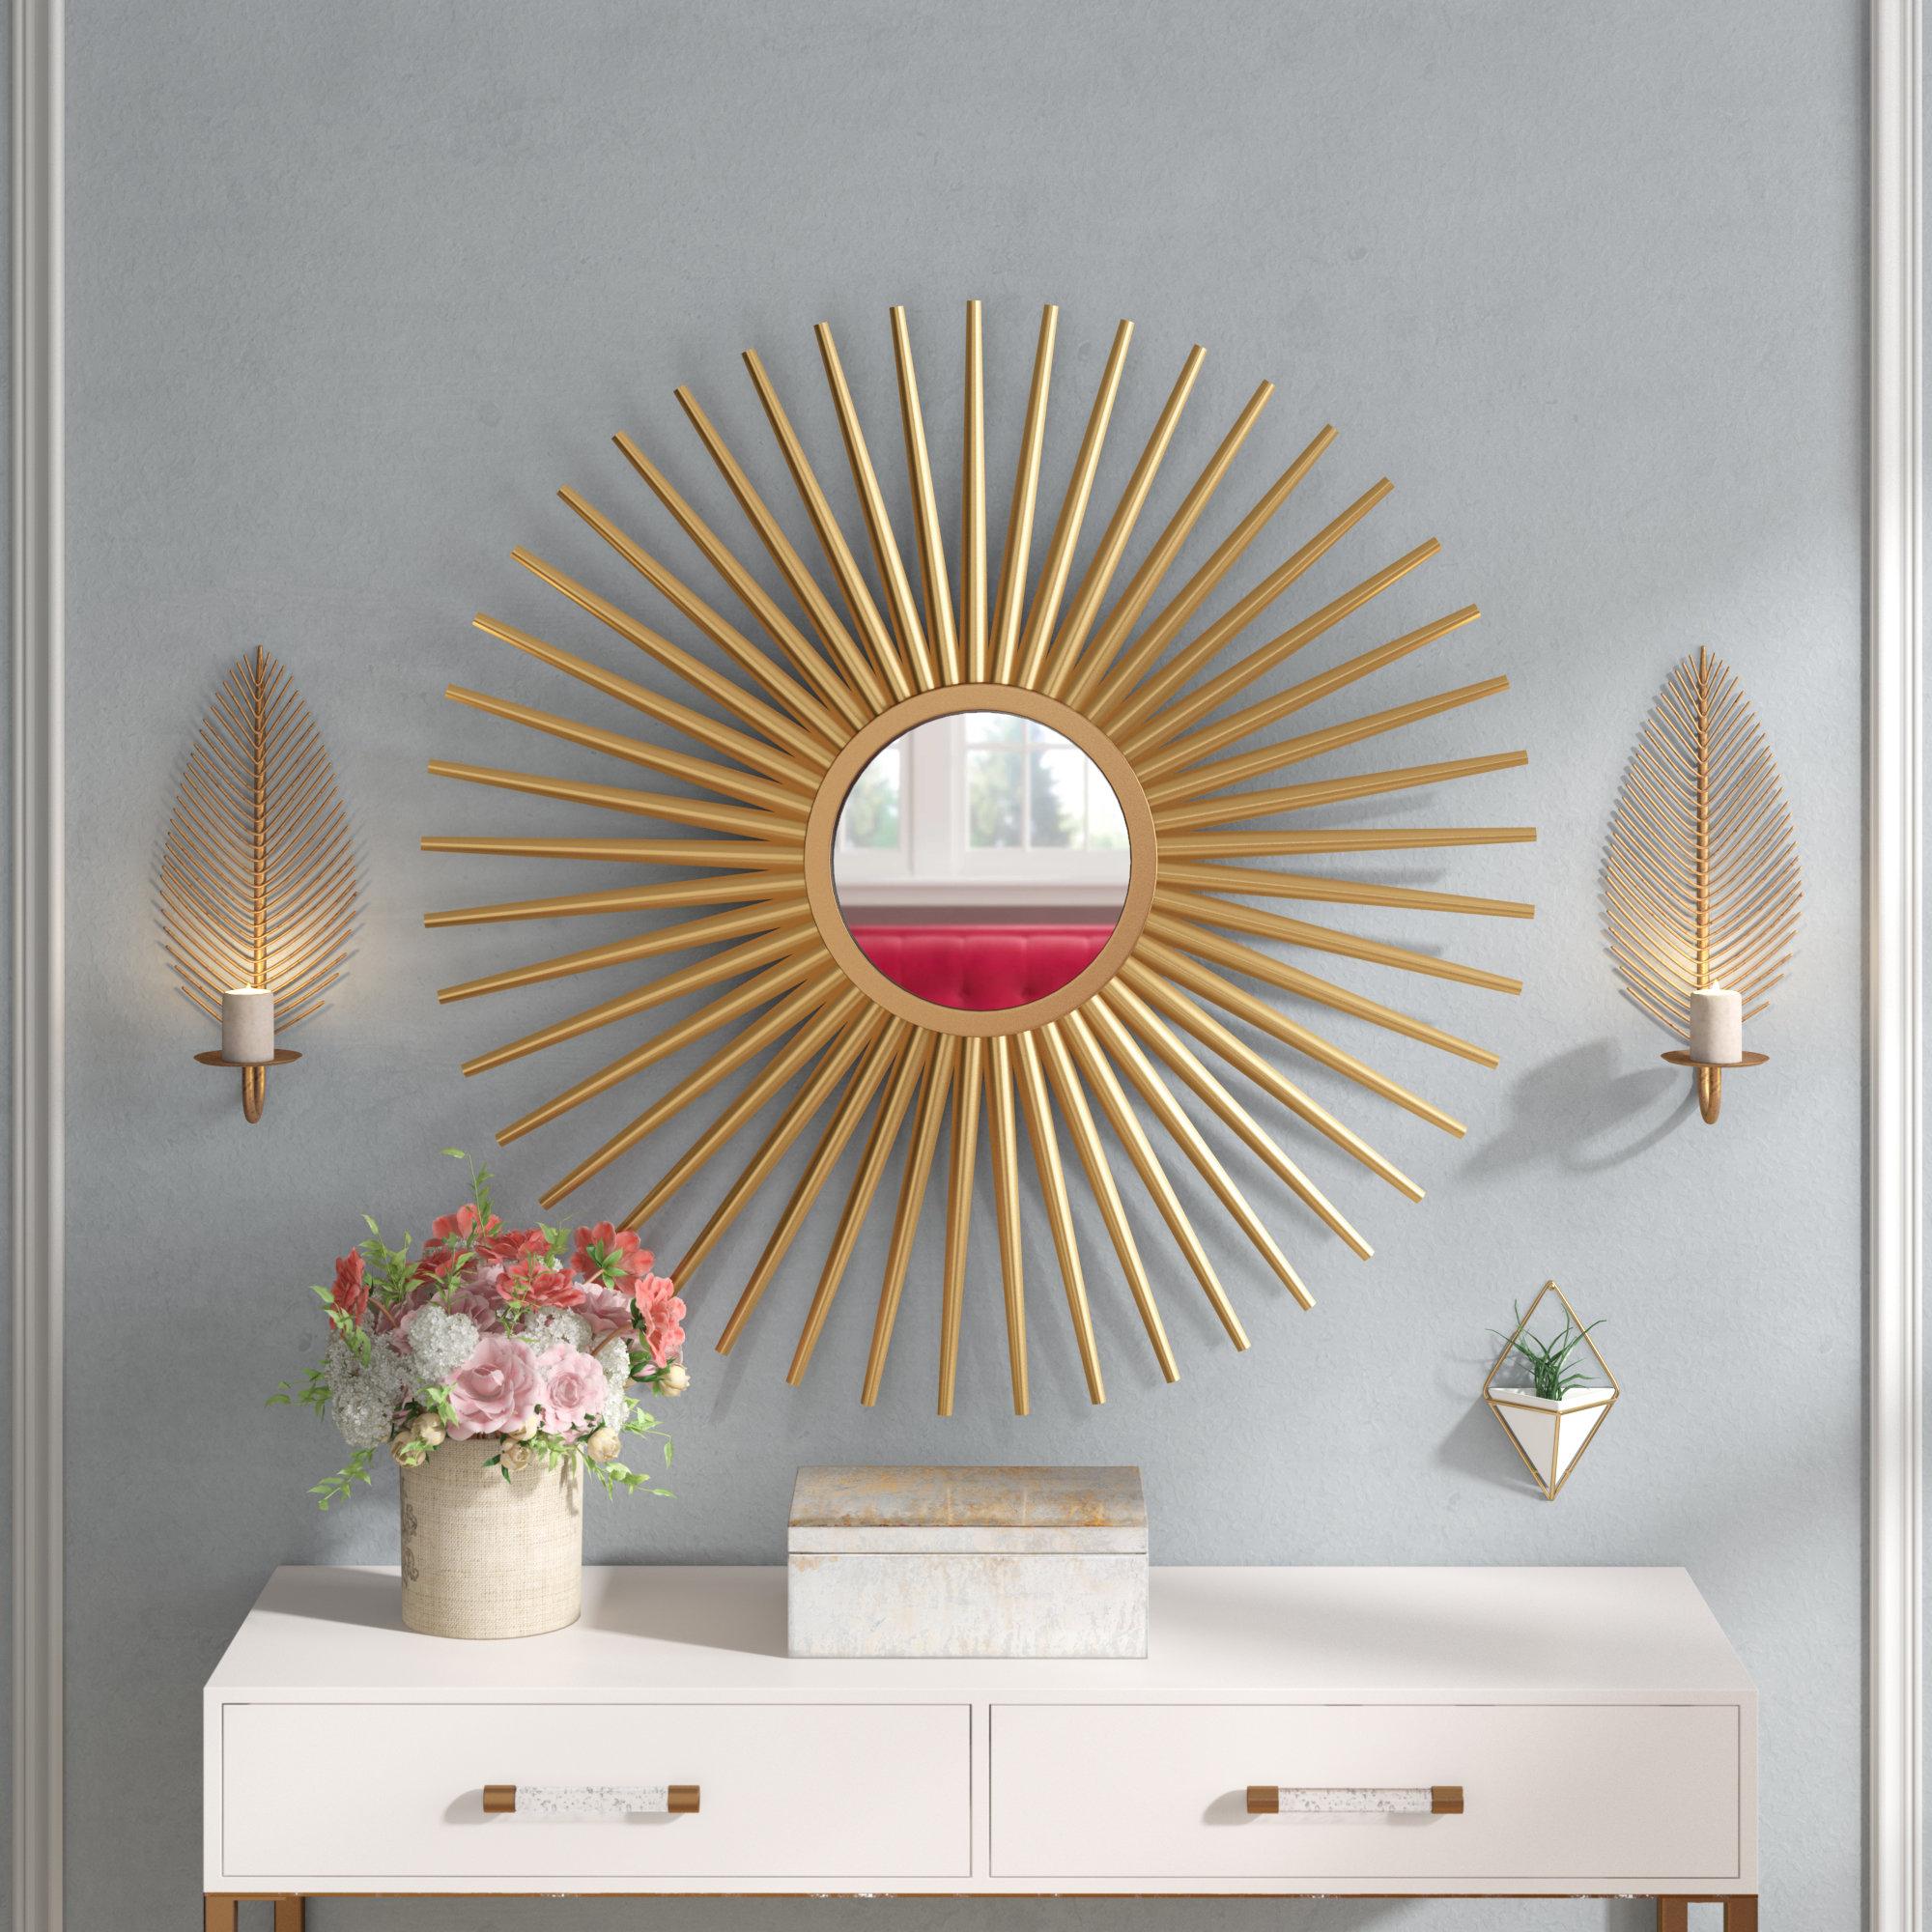 Sunburst Wall Mirrors In Well Liked Sunburst Wall Mirror (Gallery 2 of 20)